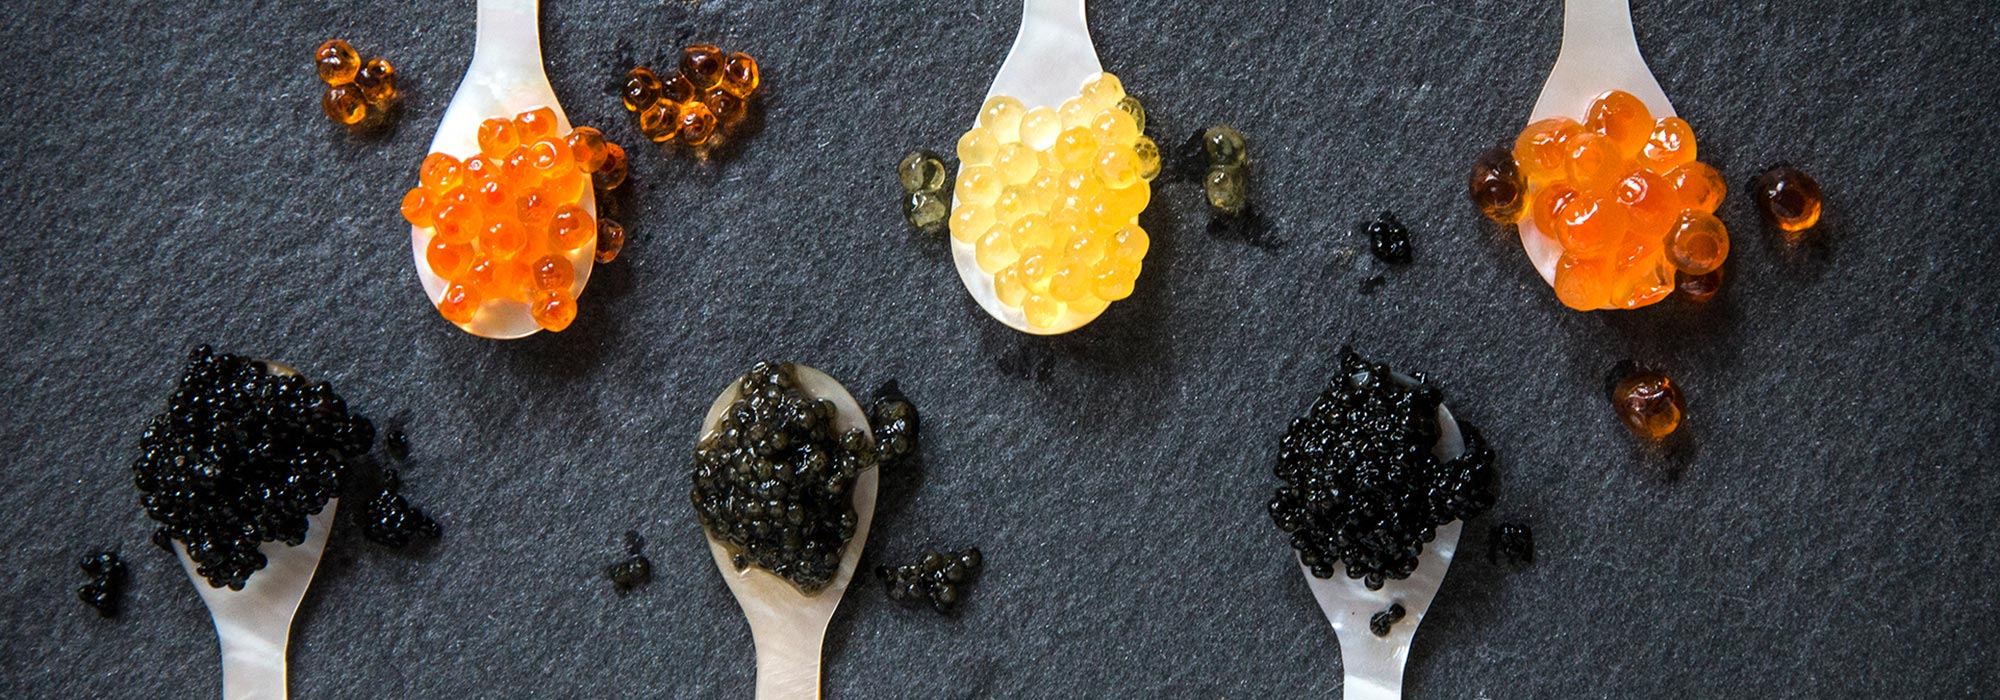 caviar-spoon-carousel.jpg